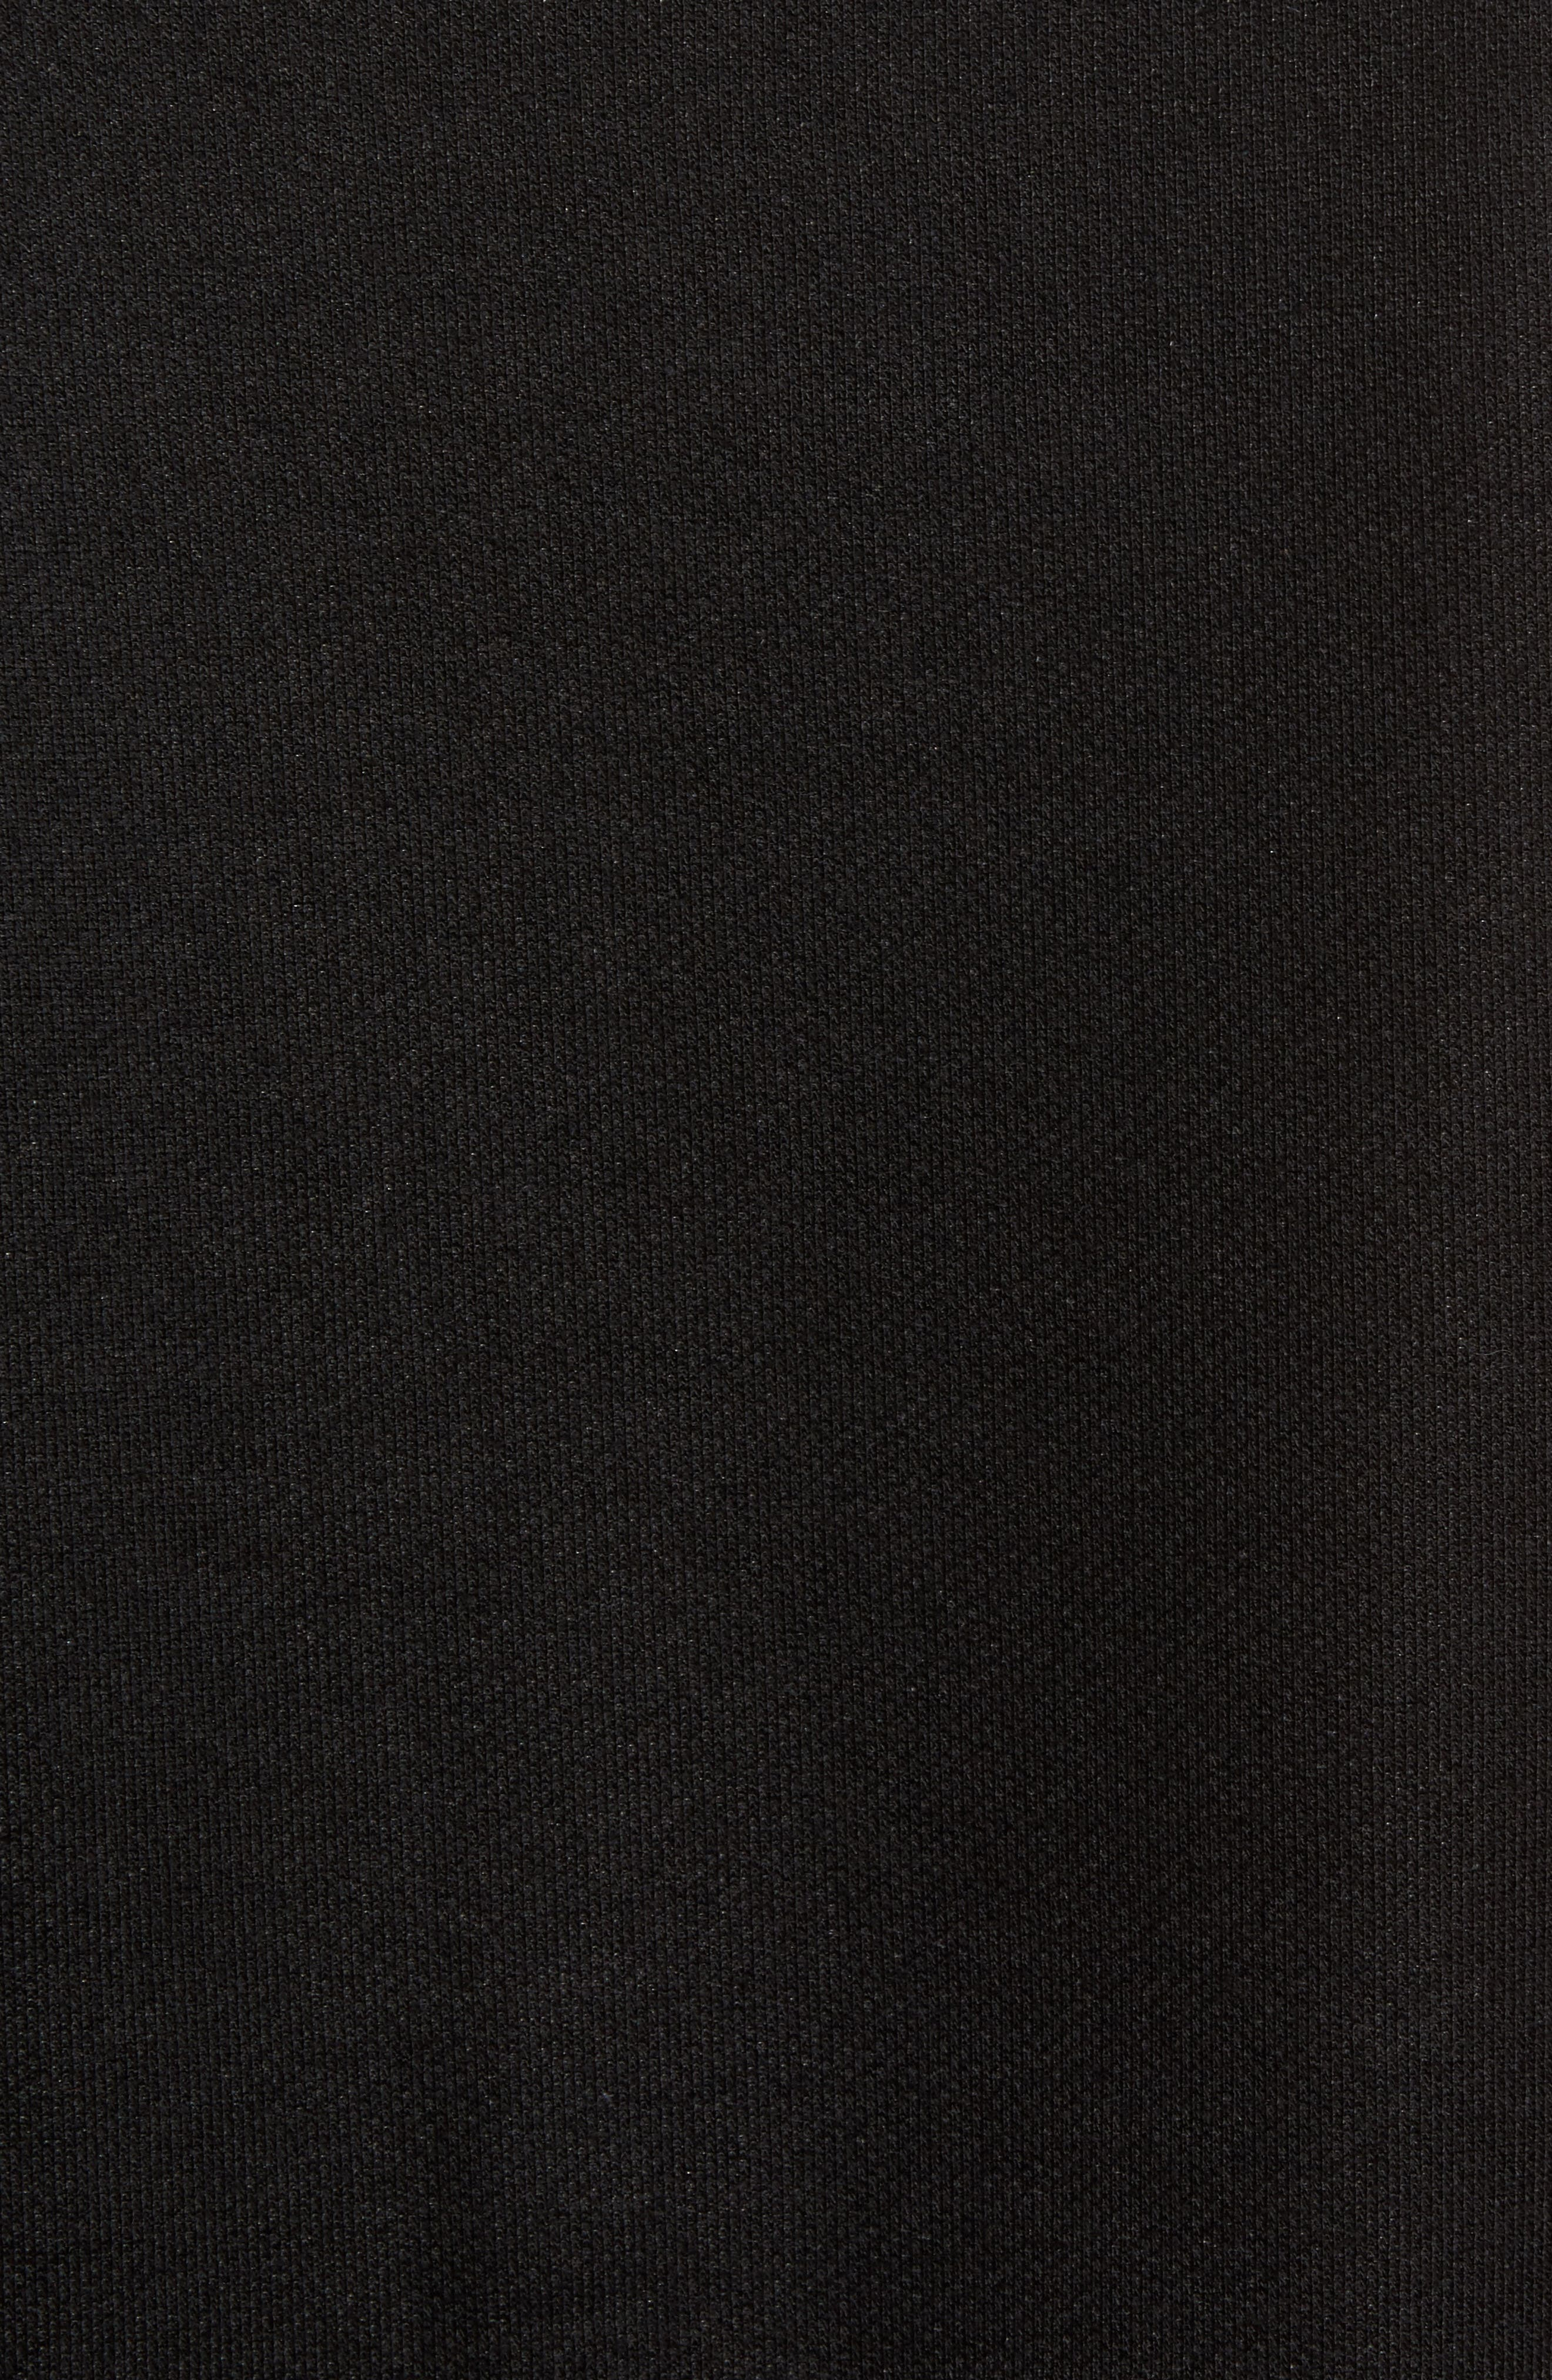 ALO, Dosha Relaxed Fit Sweatshirt Tank, Alternate thumbnail 5, color, BLACK